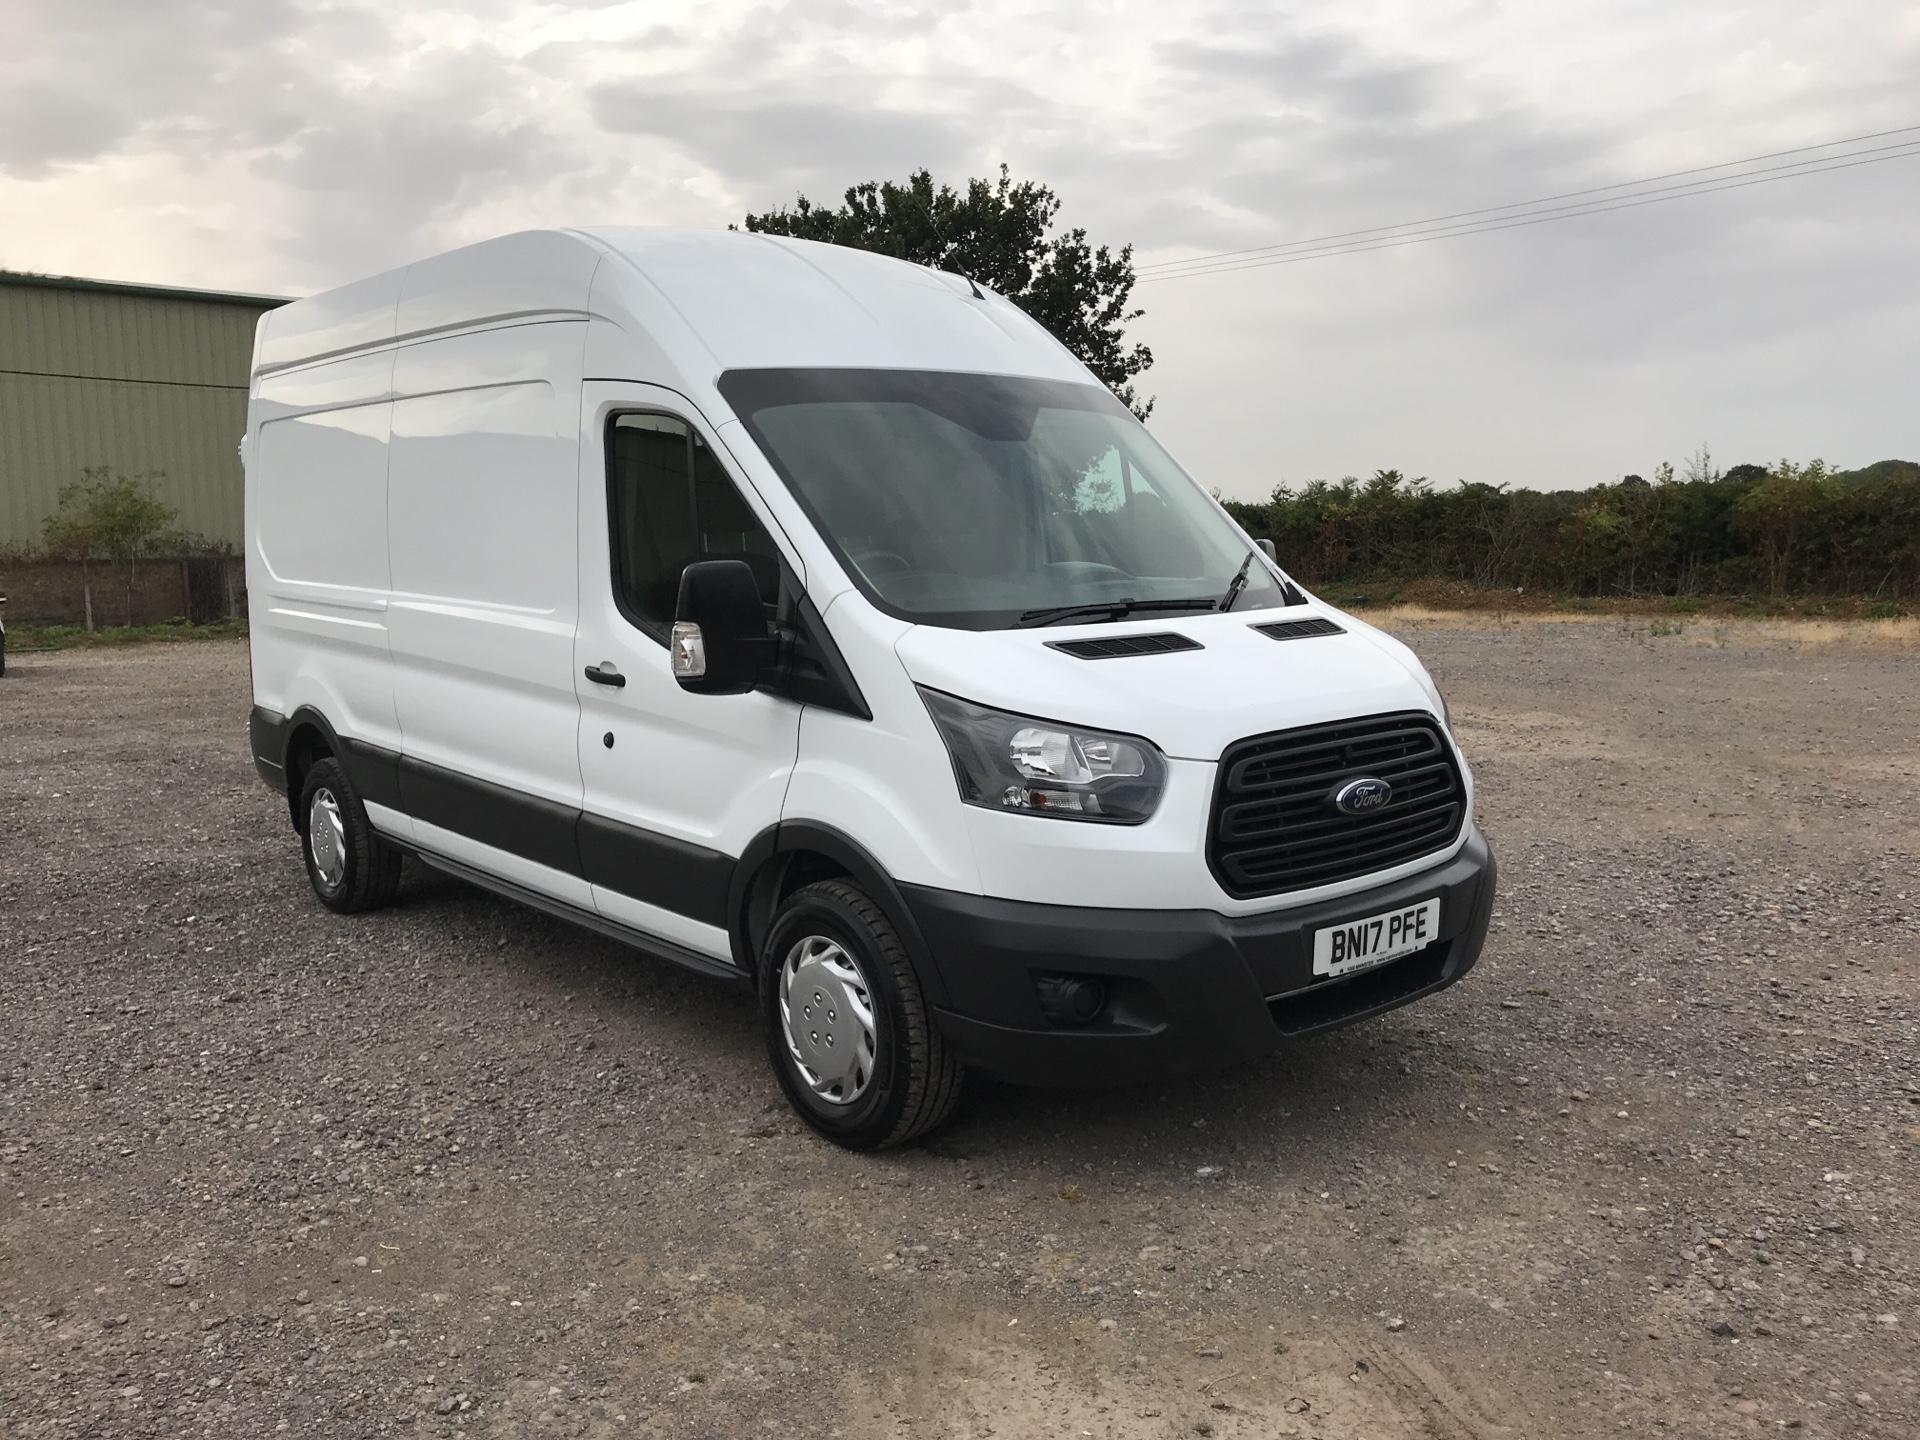 2017 Ford Transit L3 H3 VAN 130PS EURO 6 (BN17PFE)